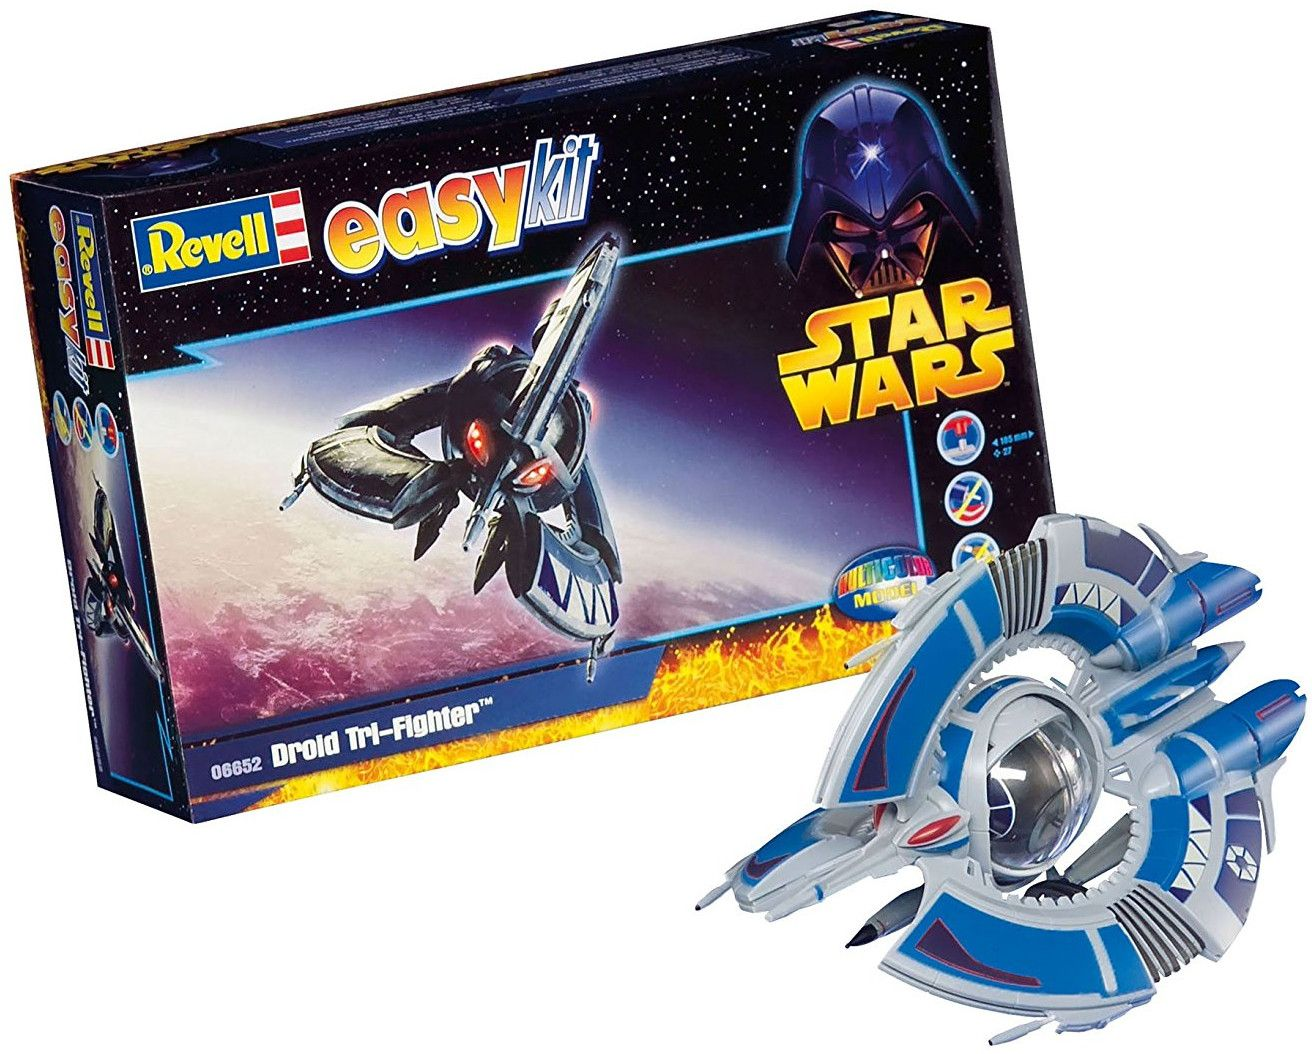 Сглобяем модел на космически кораб Revell Easykit STAR WARS - Droid Tri-Fighter (06652) - 1